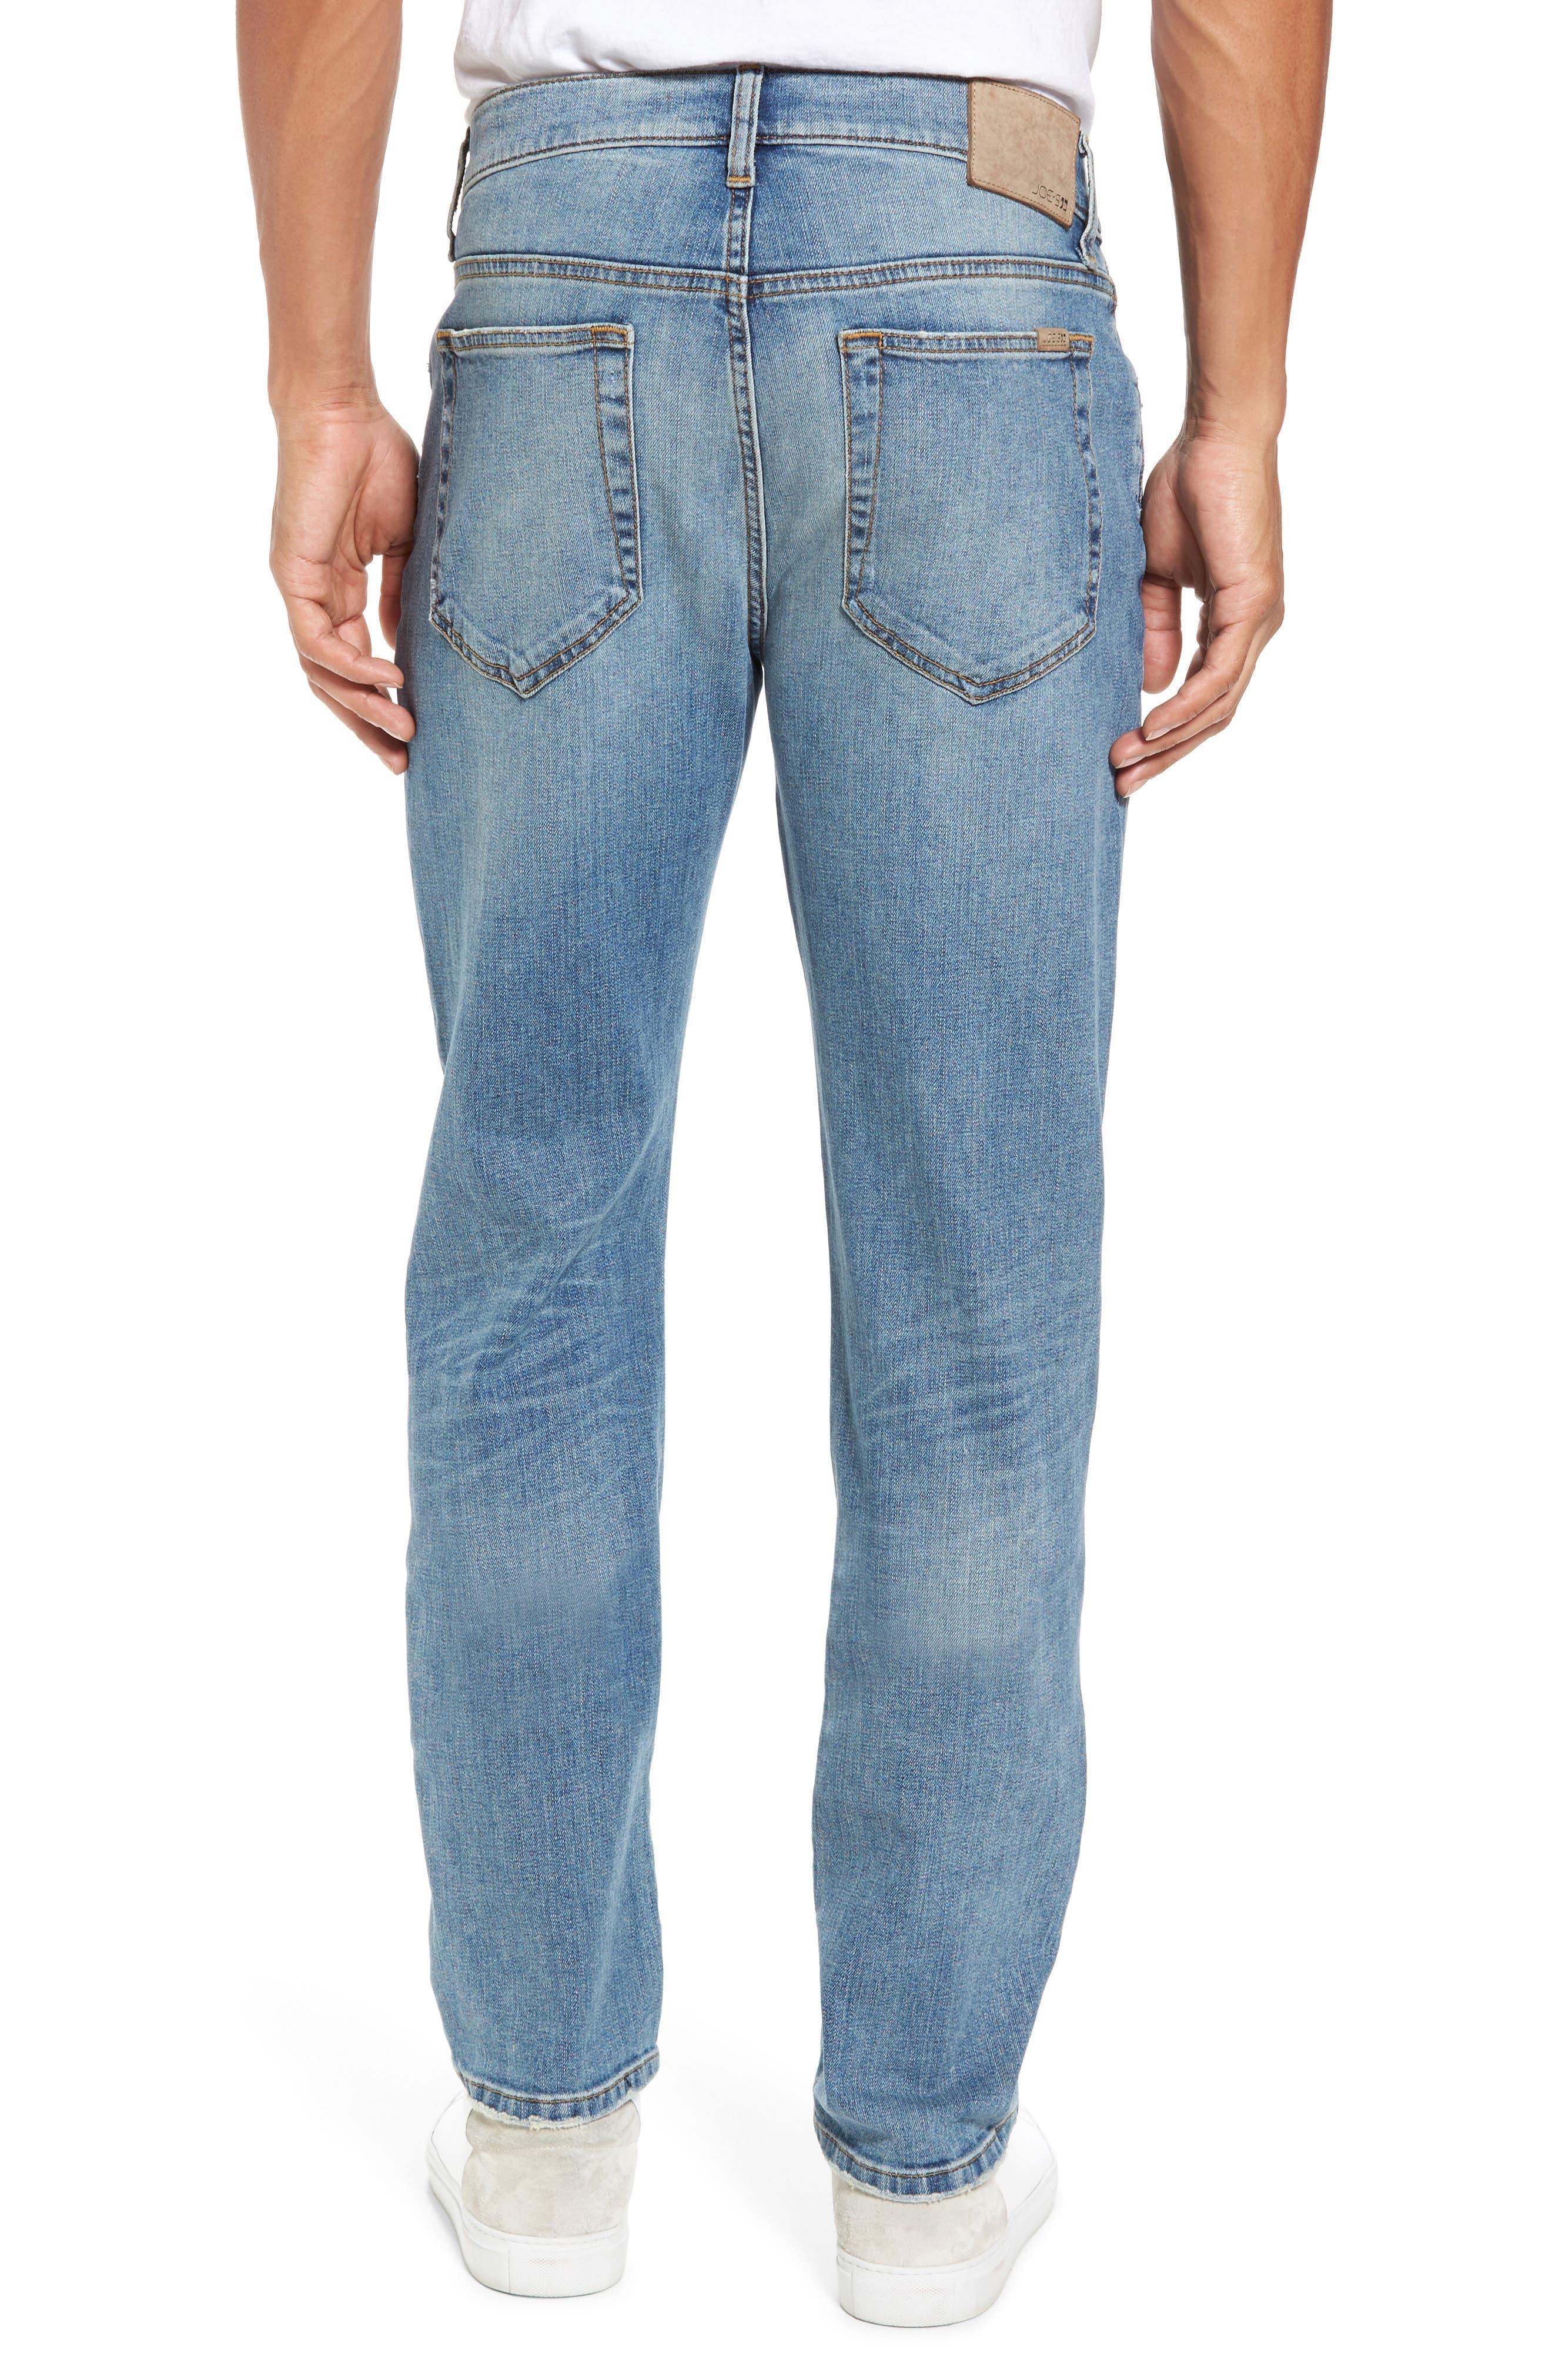 Brixton Slim Straight Fit Jeans,                             Alternate thumbnail 2, color,                             Wyman